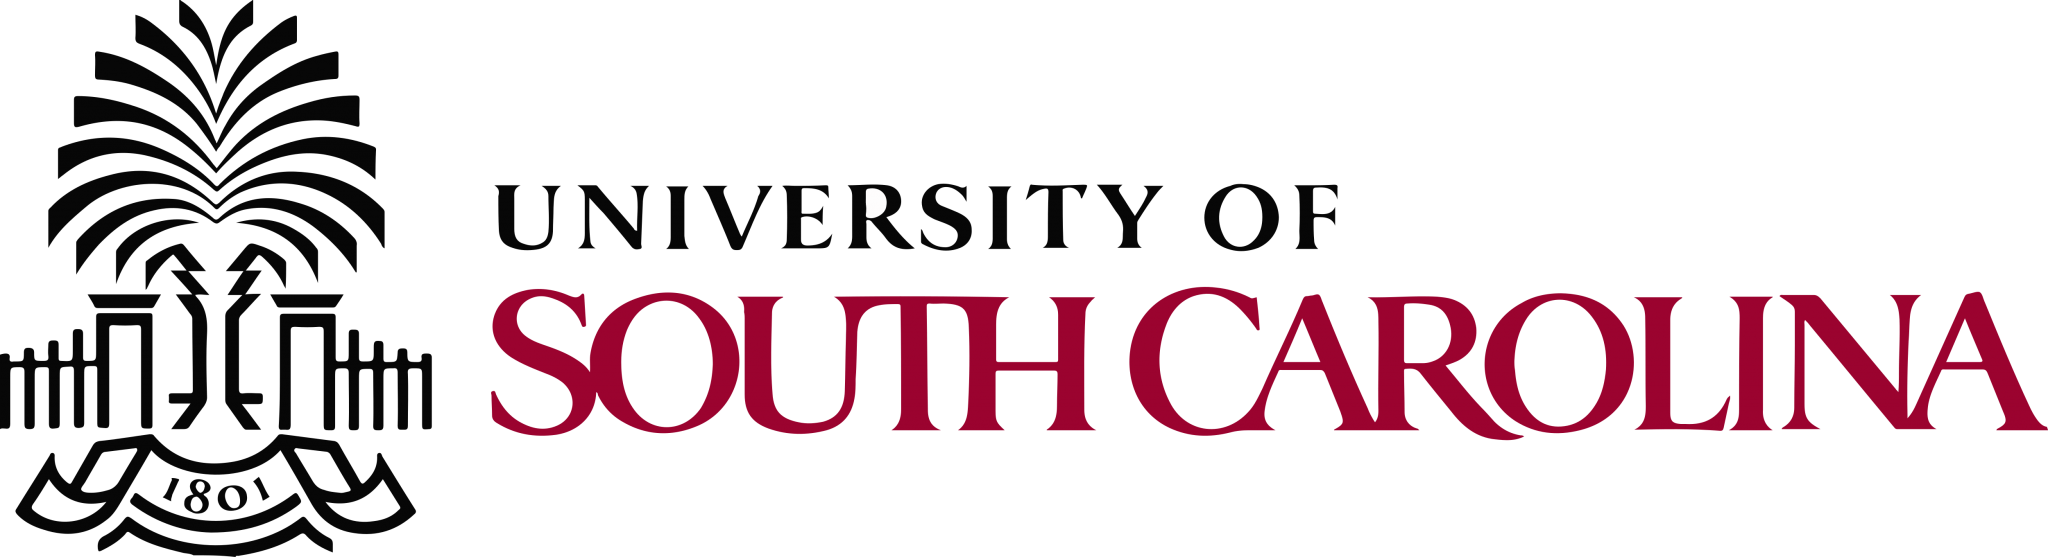 University-of-South-Carolina-Logo-2048x557